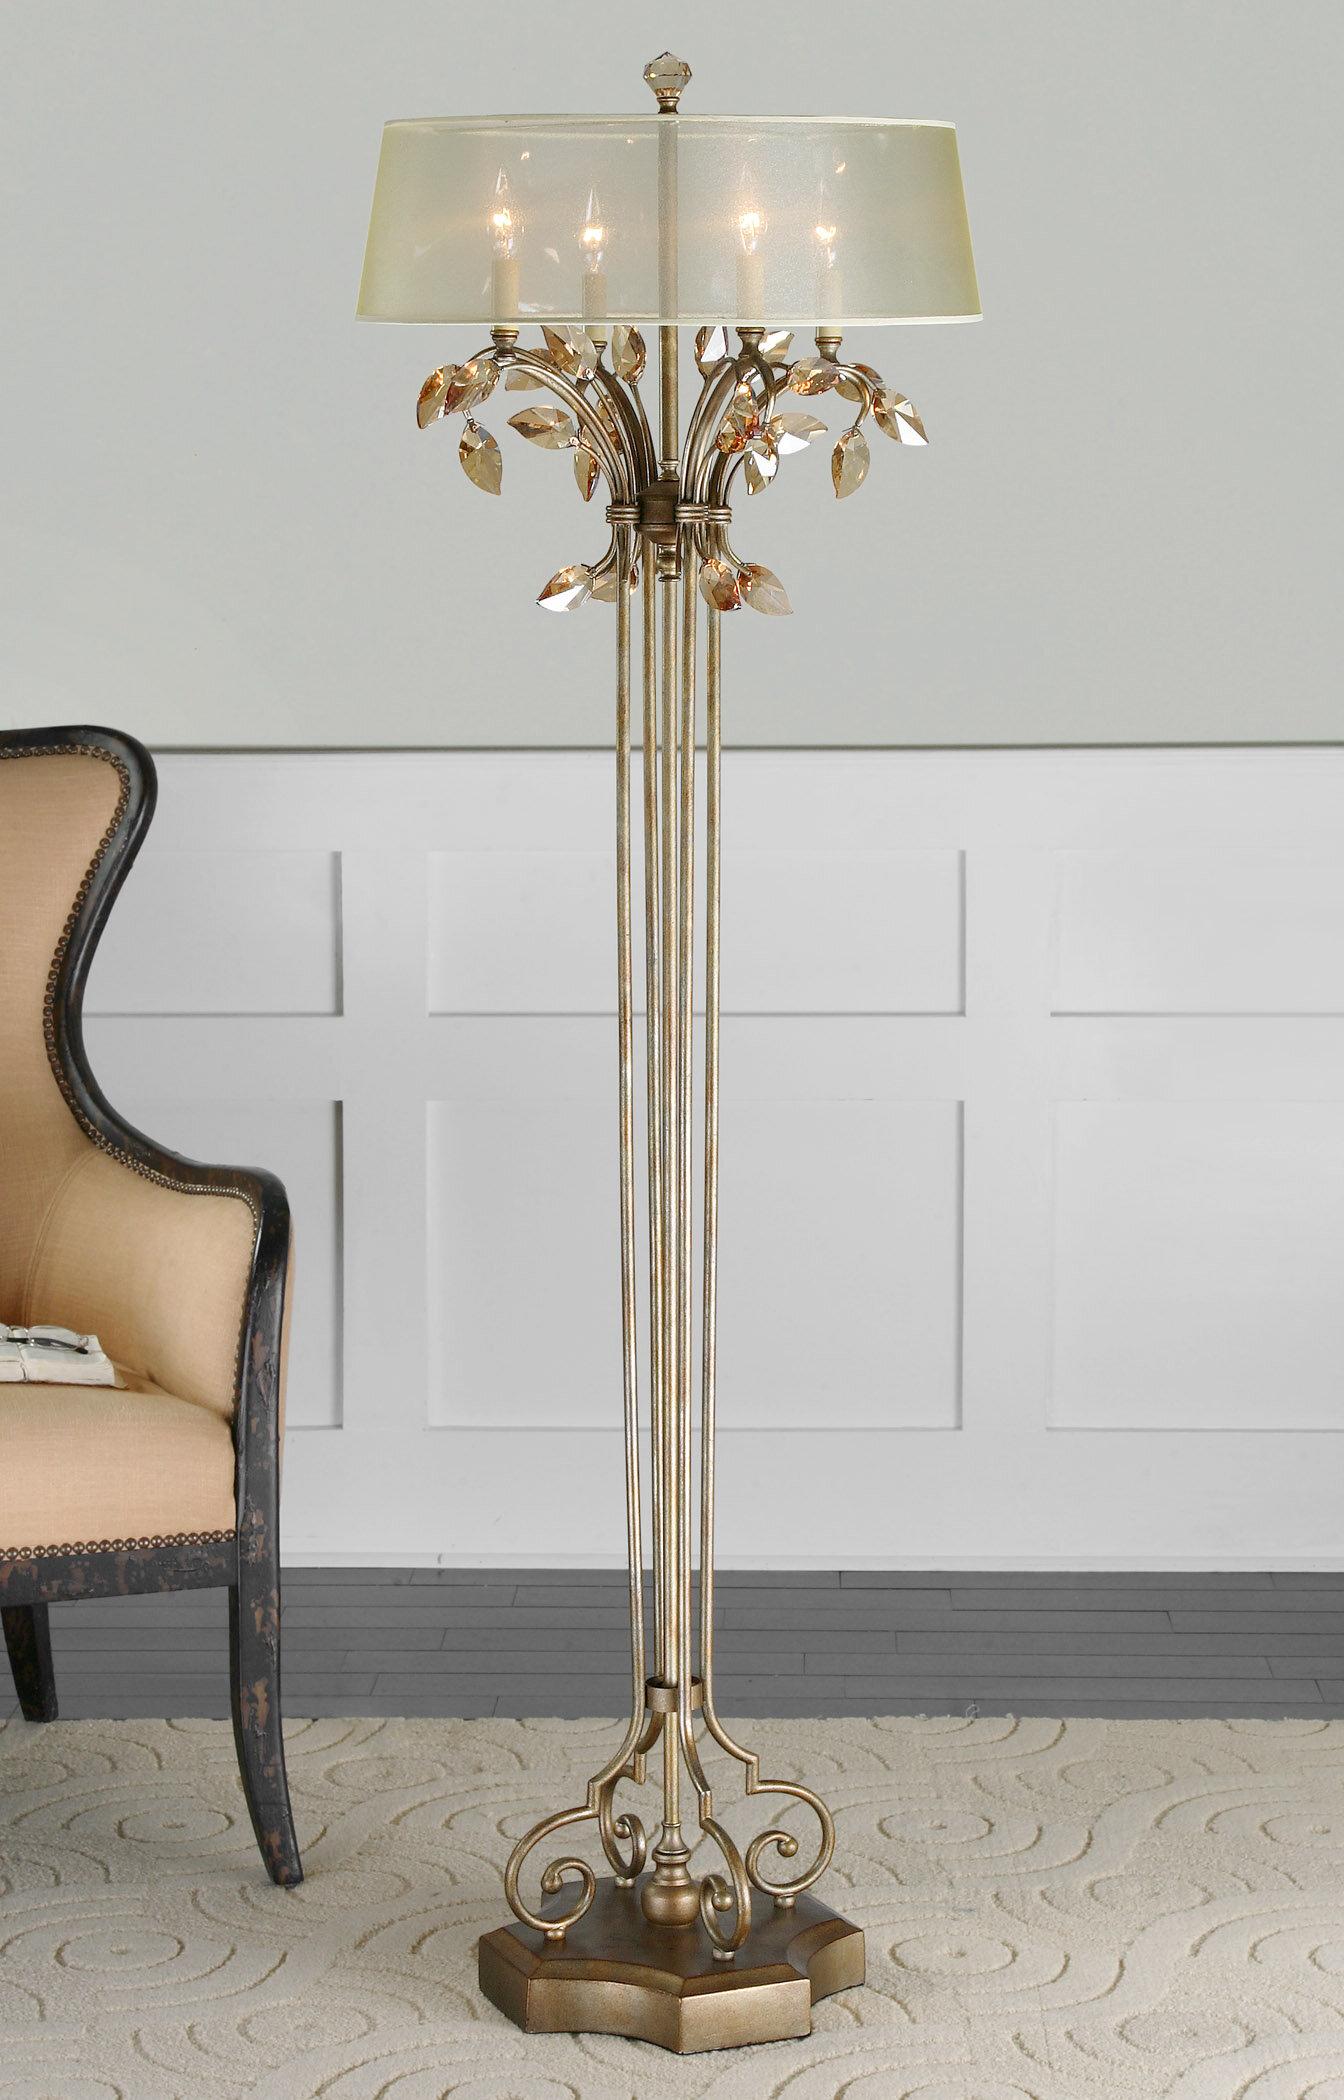 Astoria grand wadsworth 65 candelabra floor lamp reviews wayfair aloadofball Images